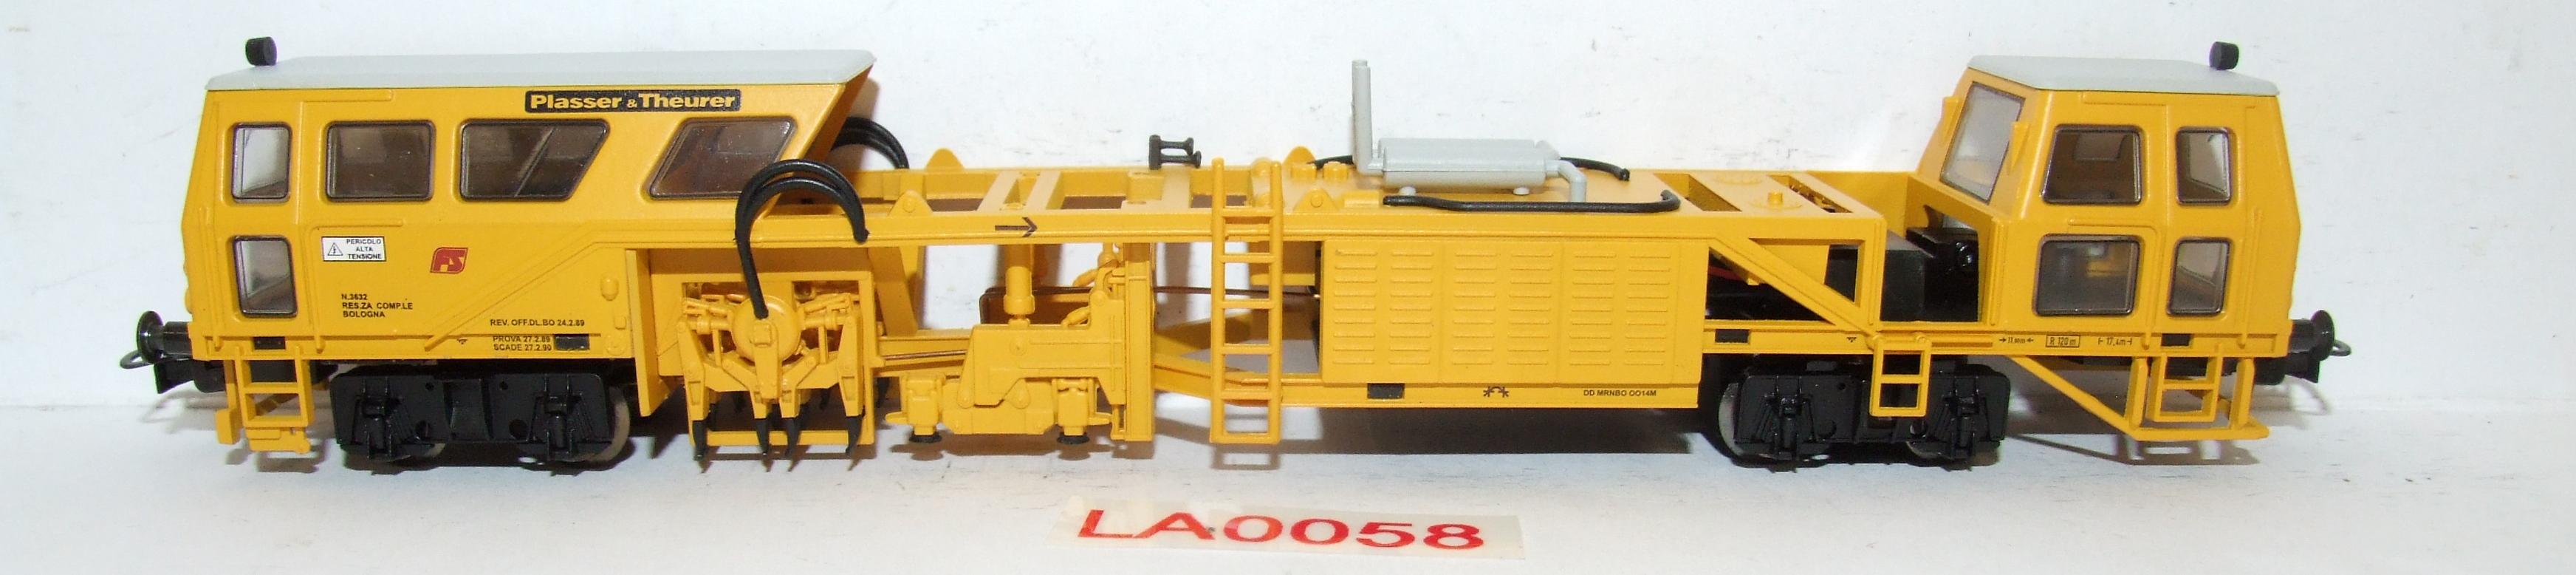 "LA0058 Liliput H0 L 136119 FS Rincalzatrice Bolonga ""Plasser & Theurer"" in OVP"